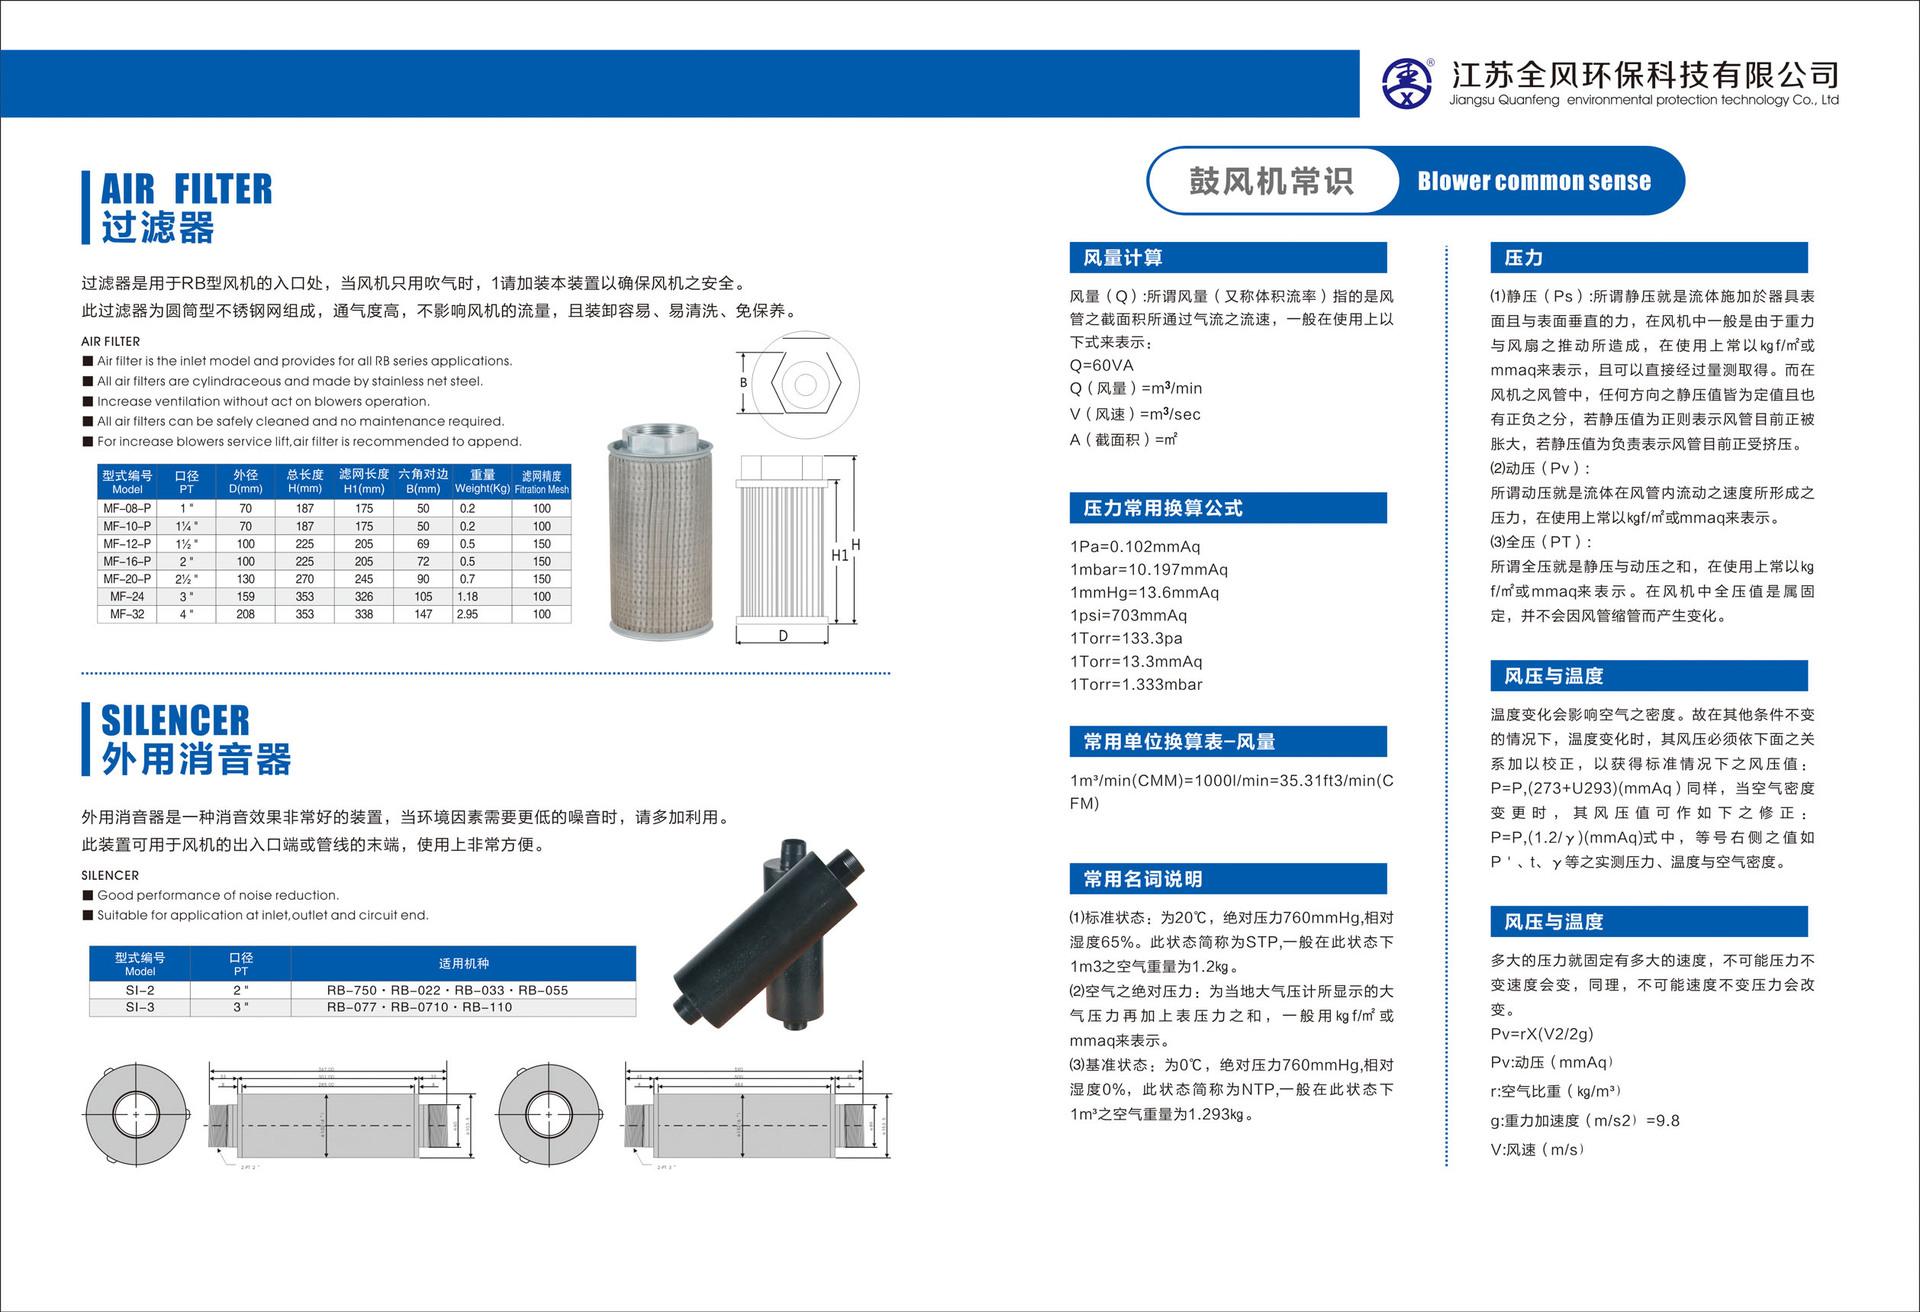 YX-52S-2双叶轮高压风机  污水曝气漩涡气泵  鱼塘增氧高压风机 全风品牌 厂家直销示例图9